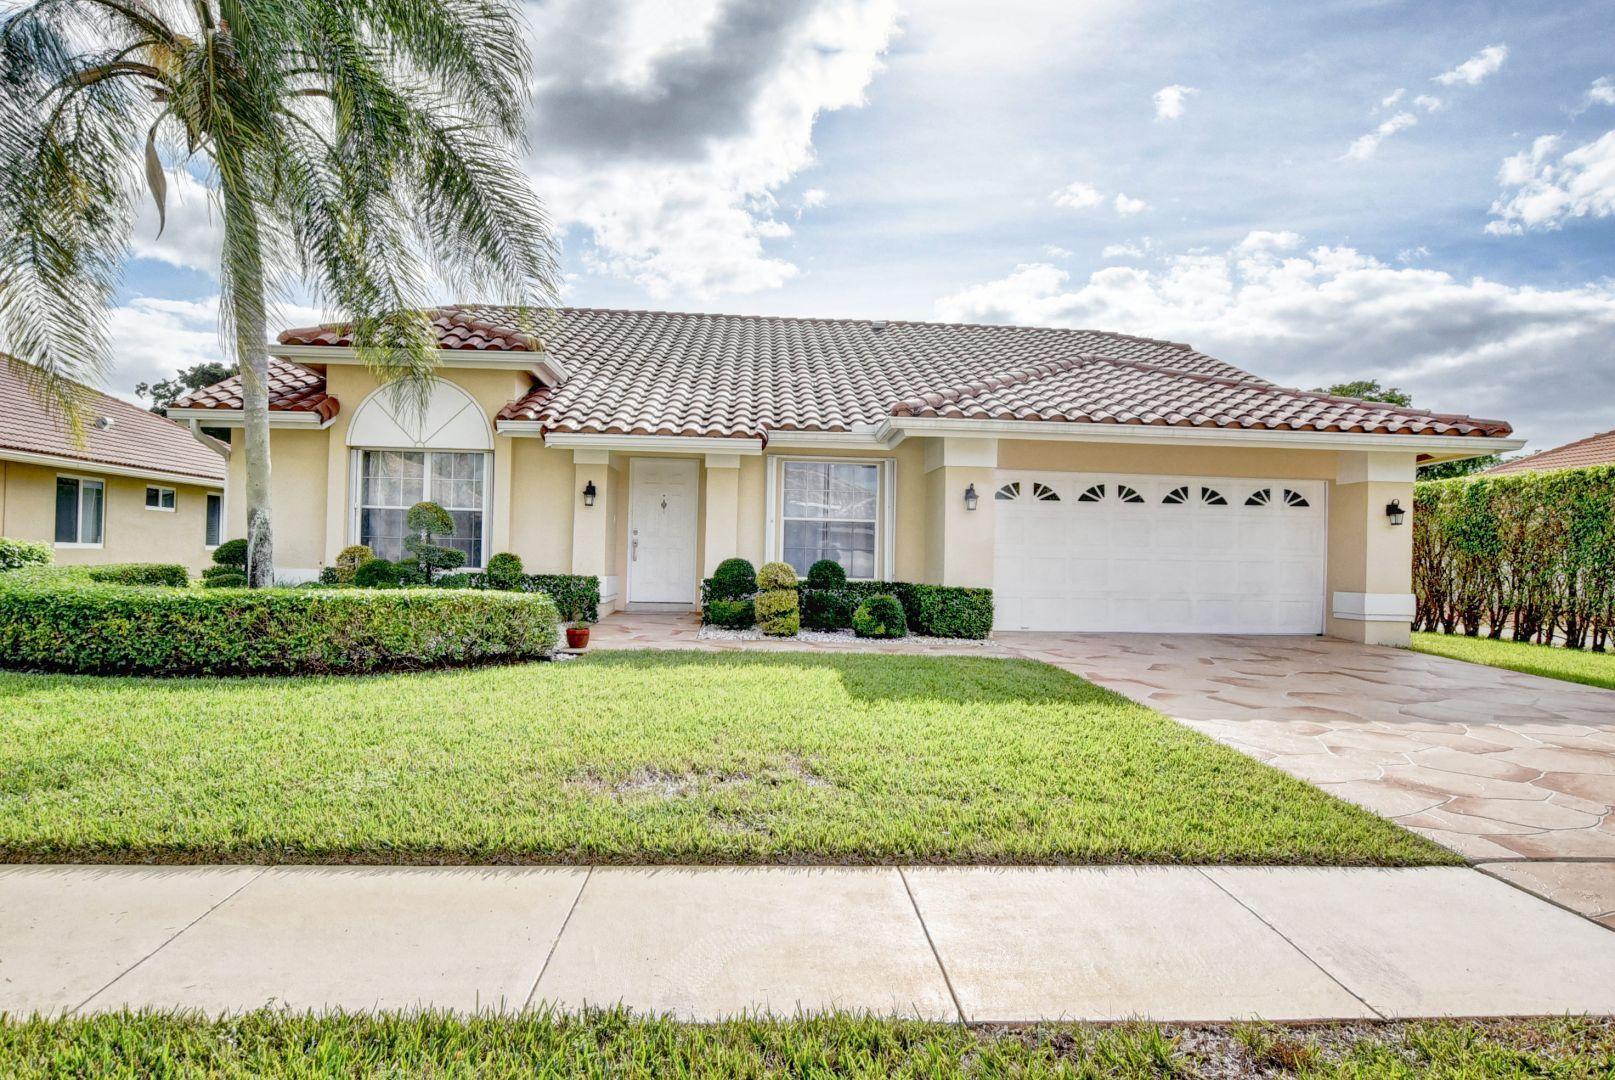 10496 Milburn Lane, Boca Raton, FL 33498